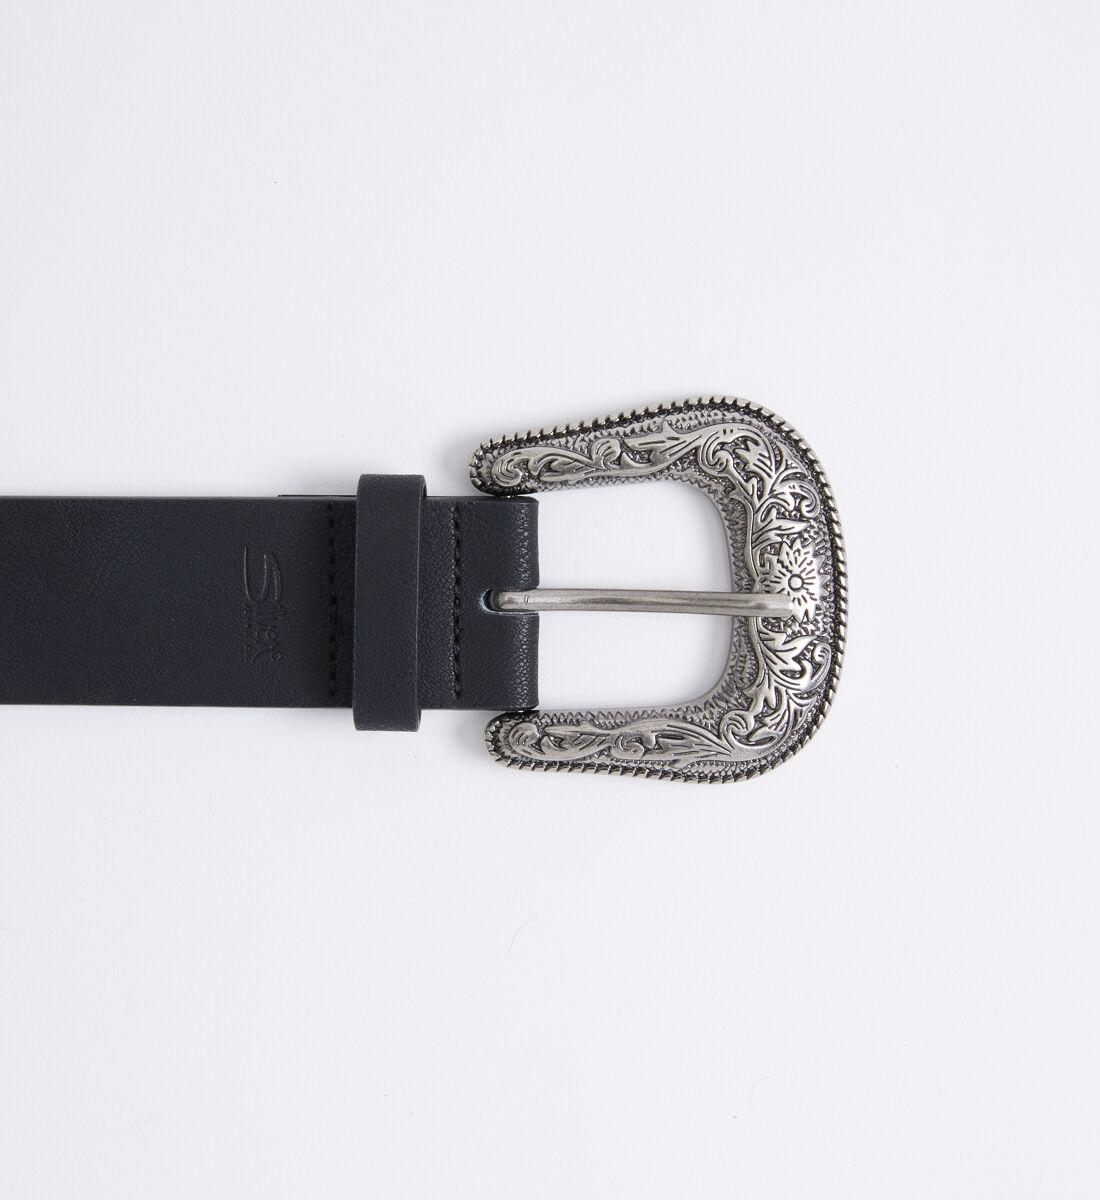 Western Studded Womens Belt Front